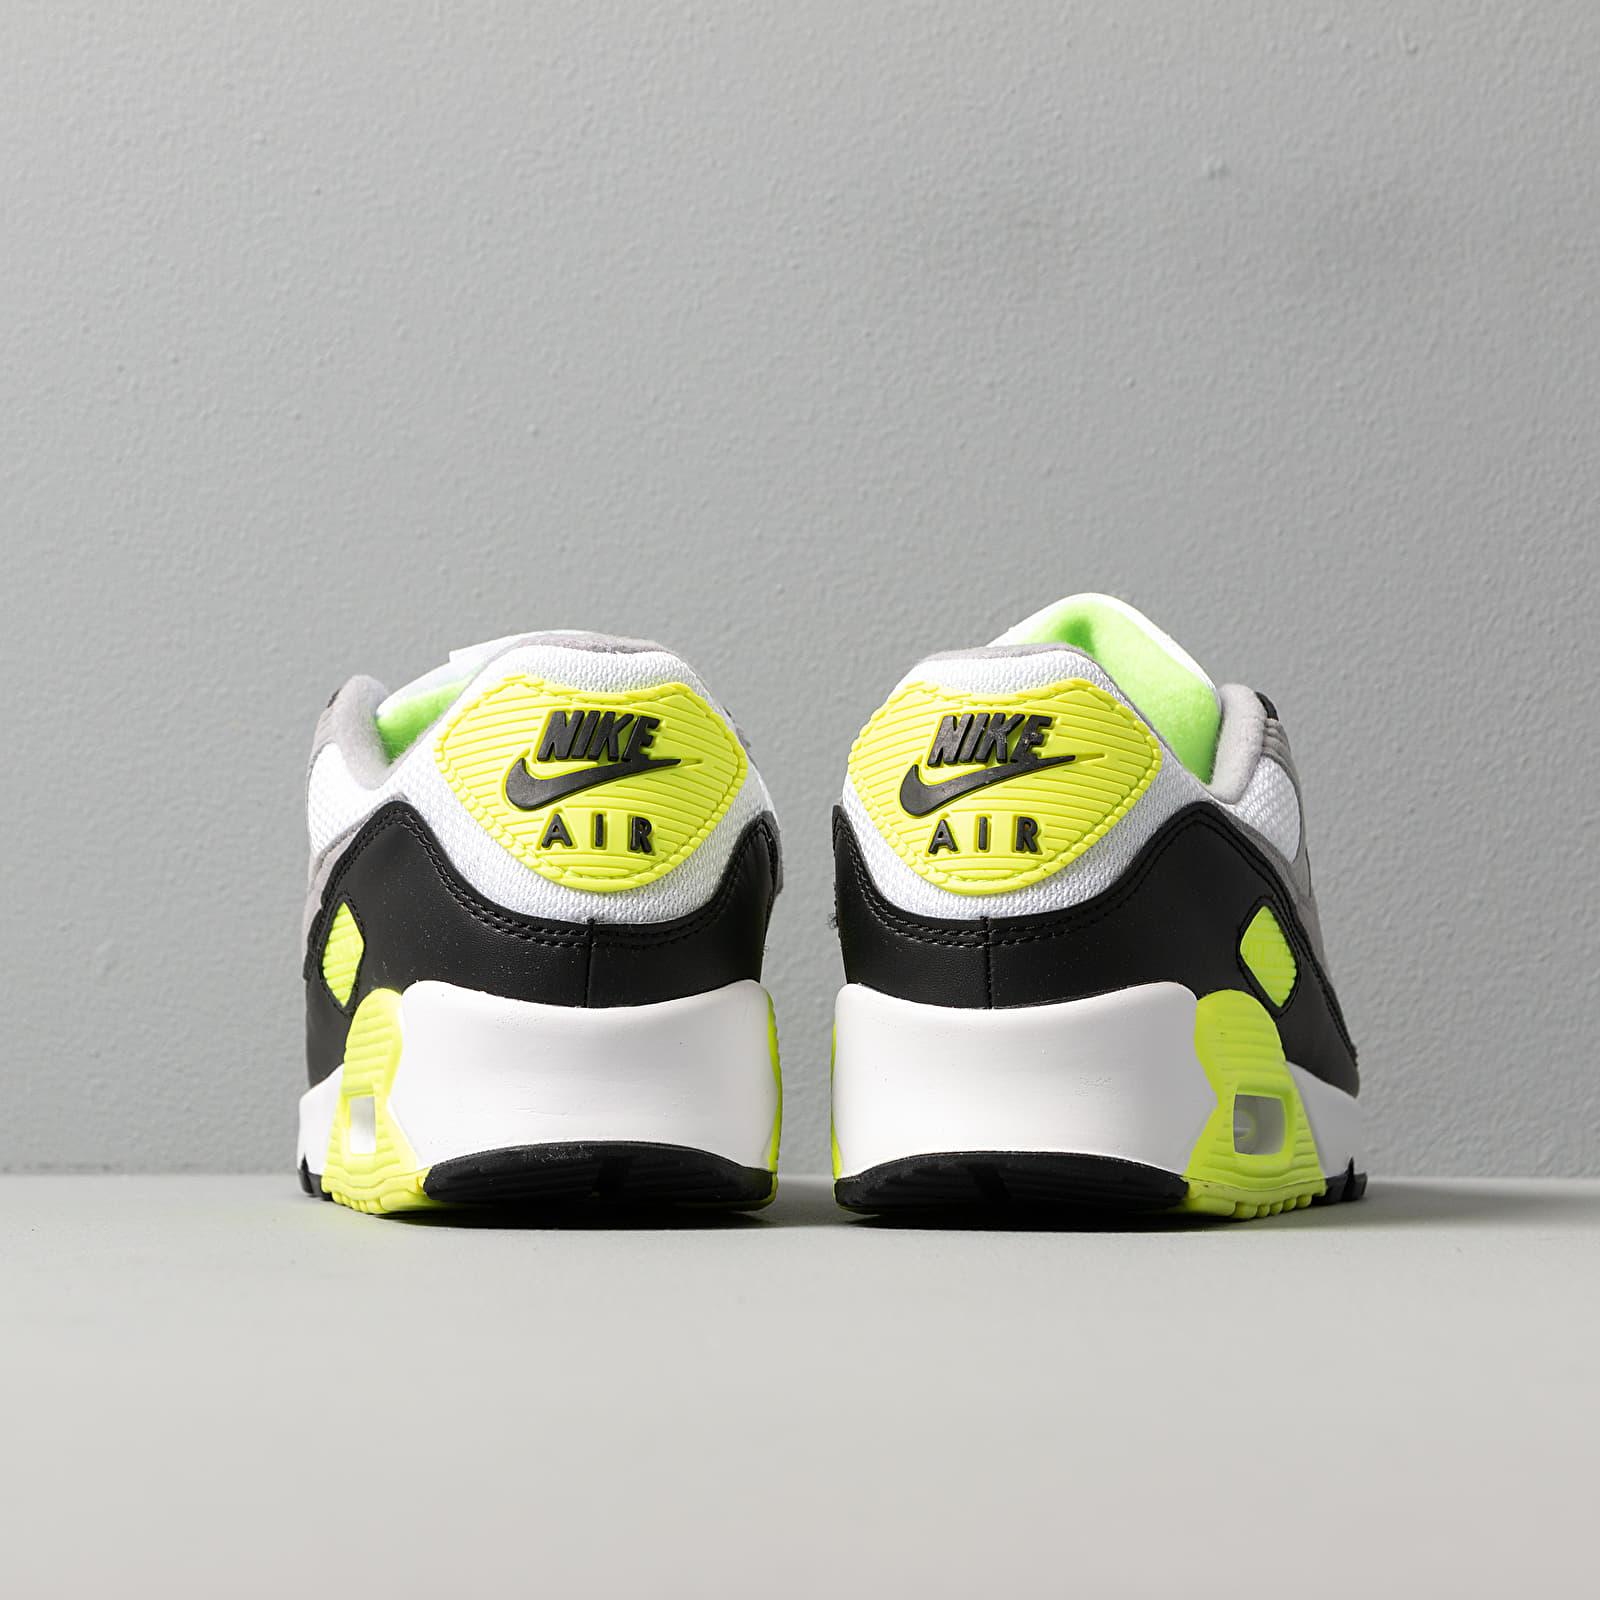 Nike Air Max 90 QS University RedPale Vanilla Hyper Grape